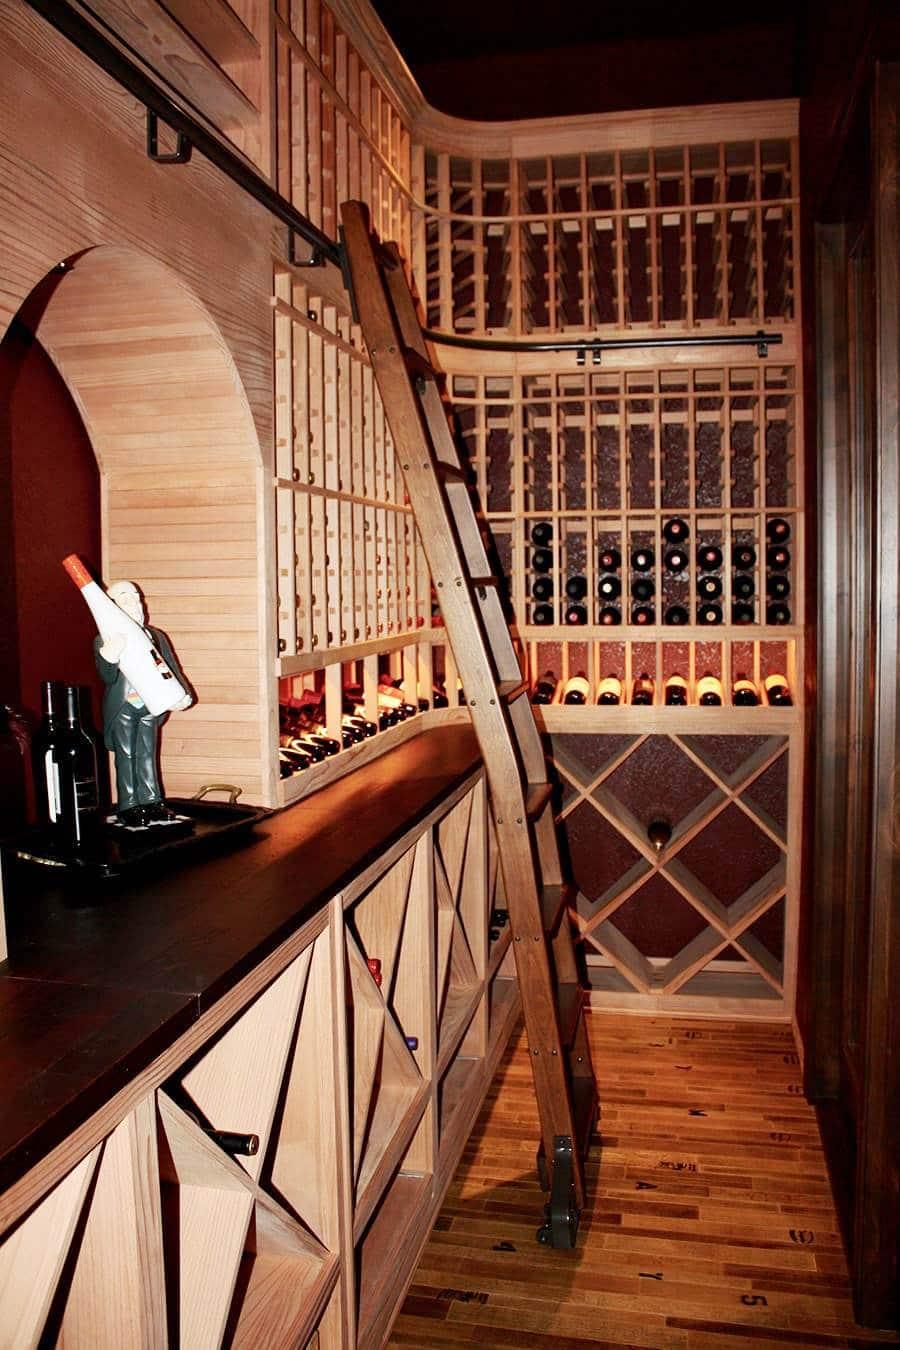 Elegant Custom Wine Cellar Created by an Expert Designer in Texas